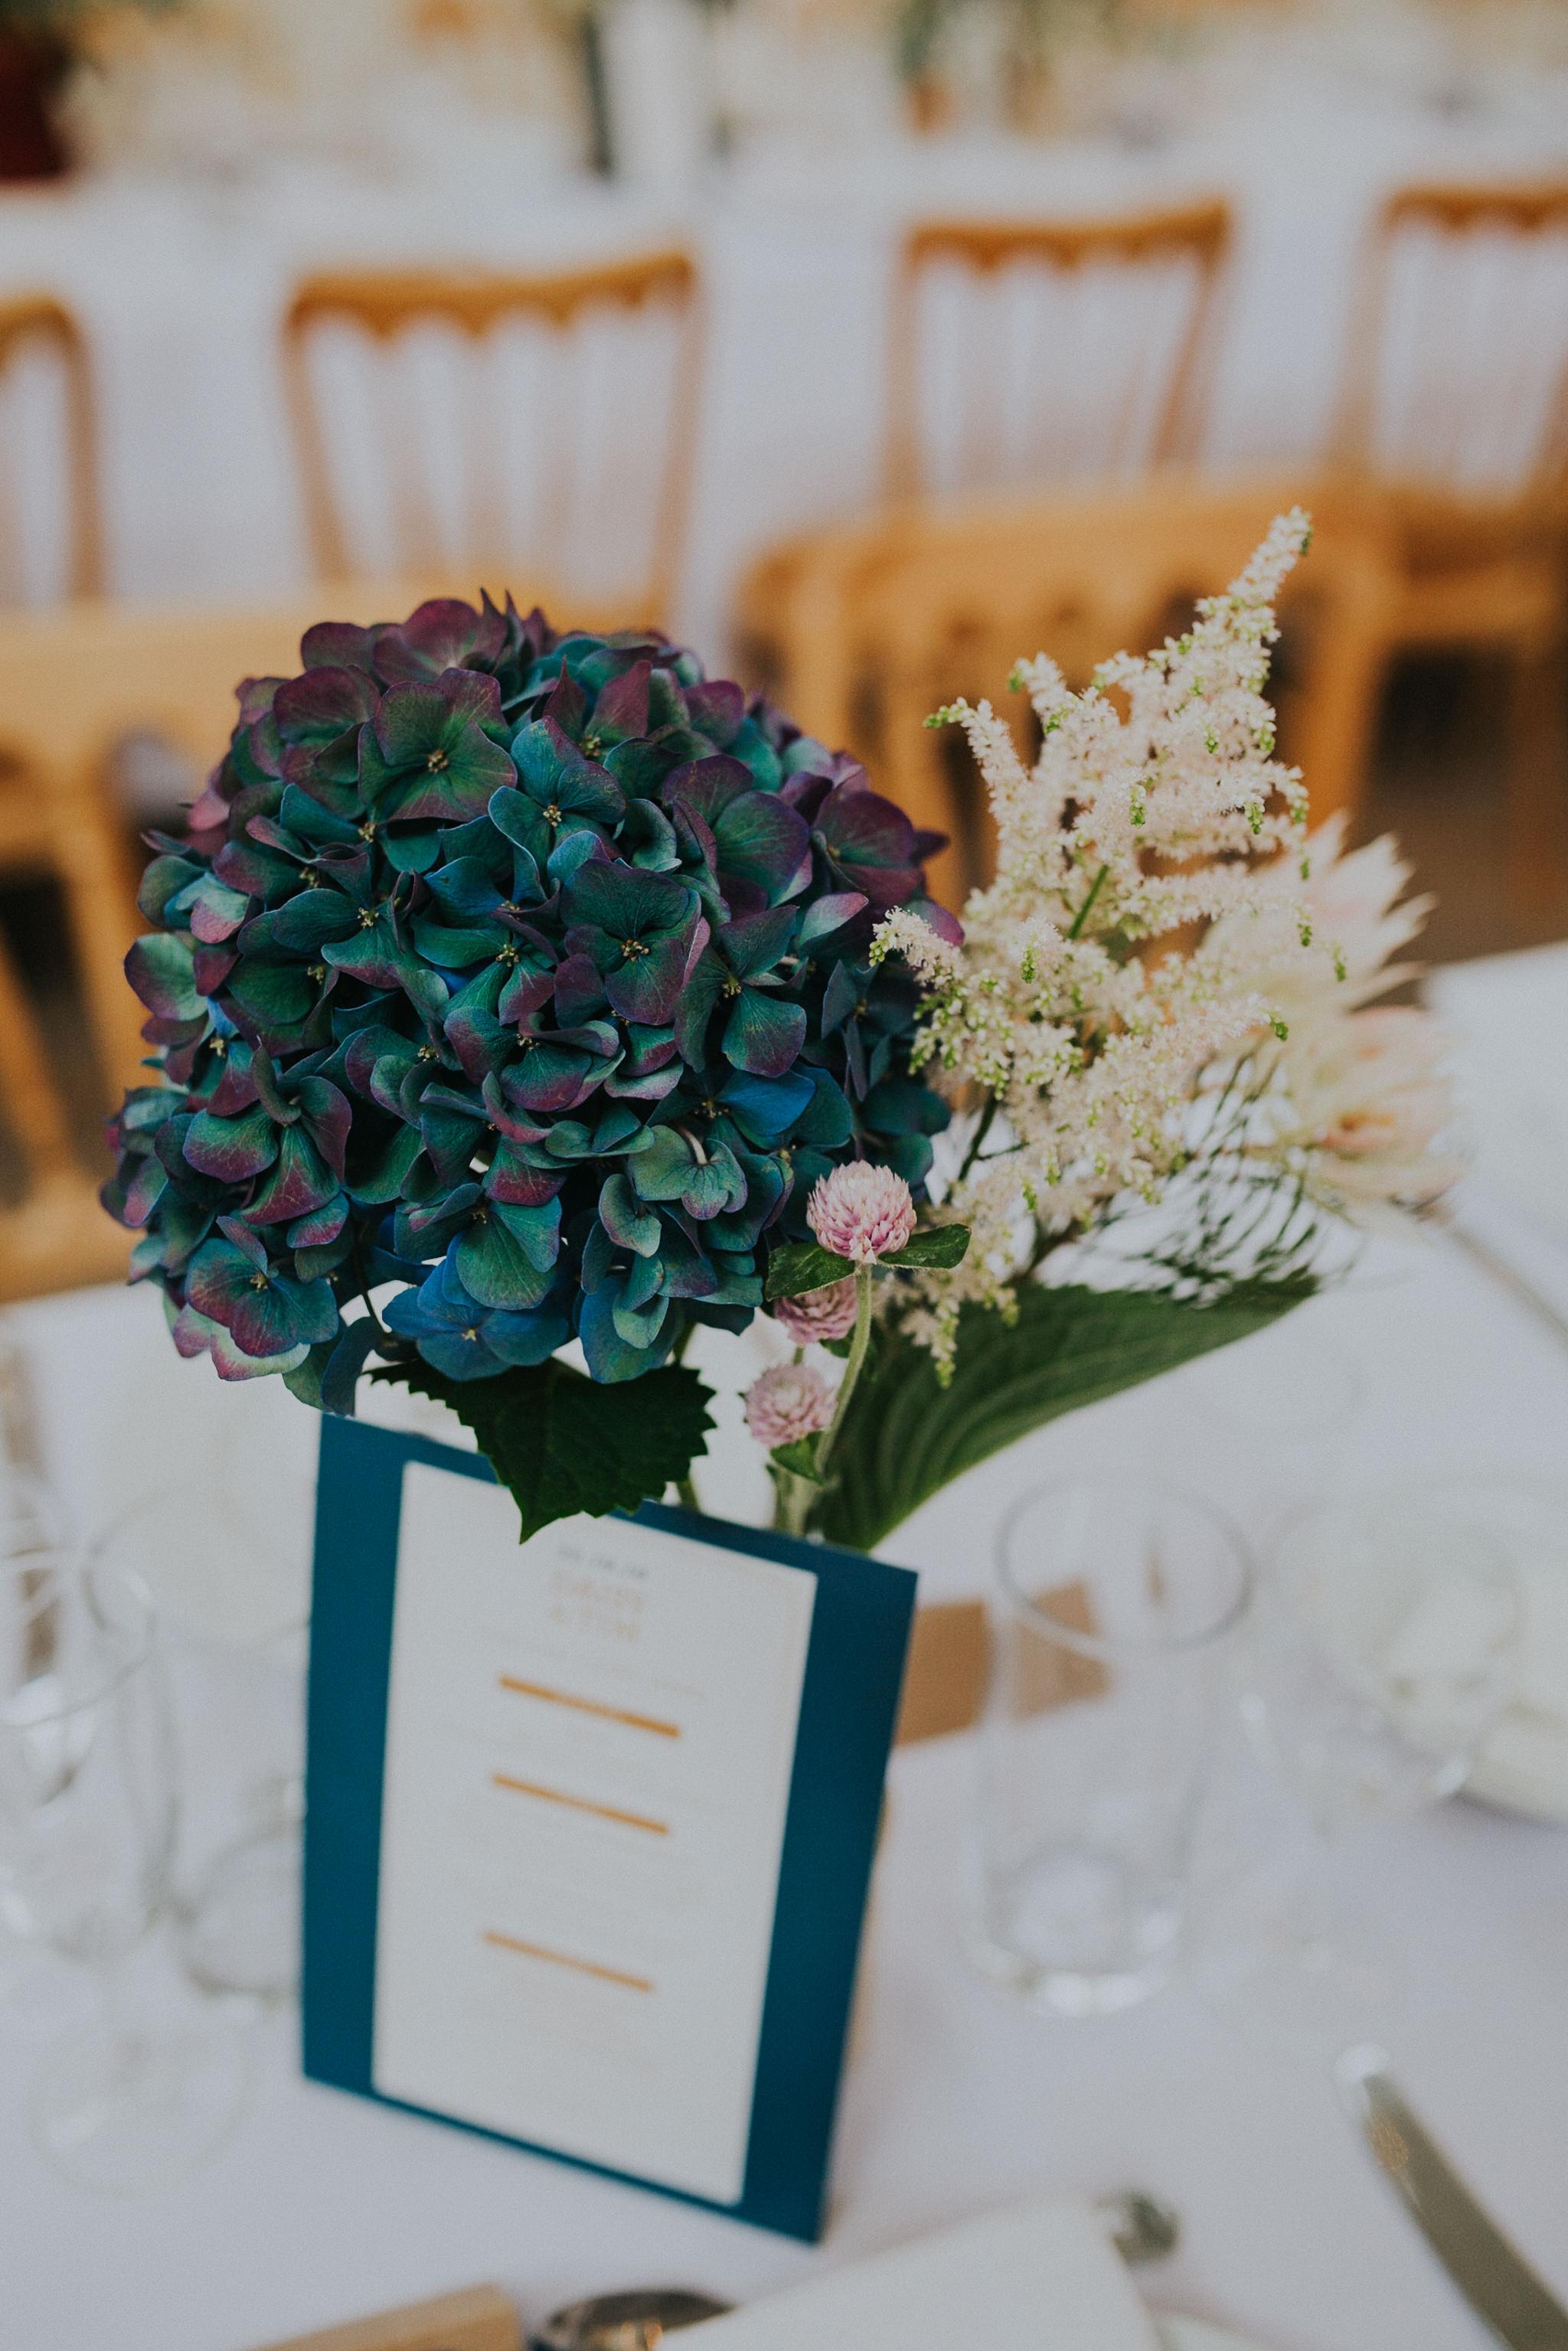 kate-gray-london-wedding-photography-42.jpg